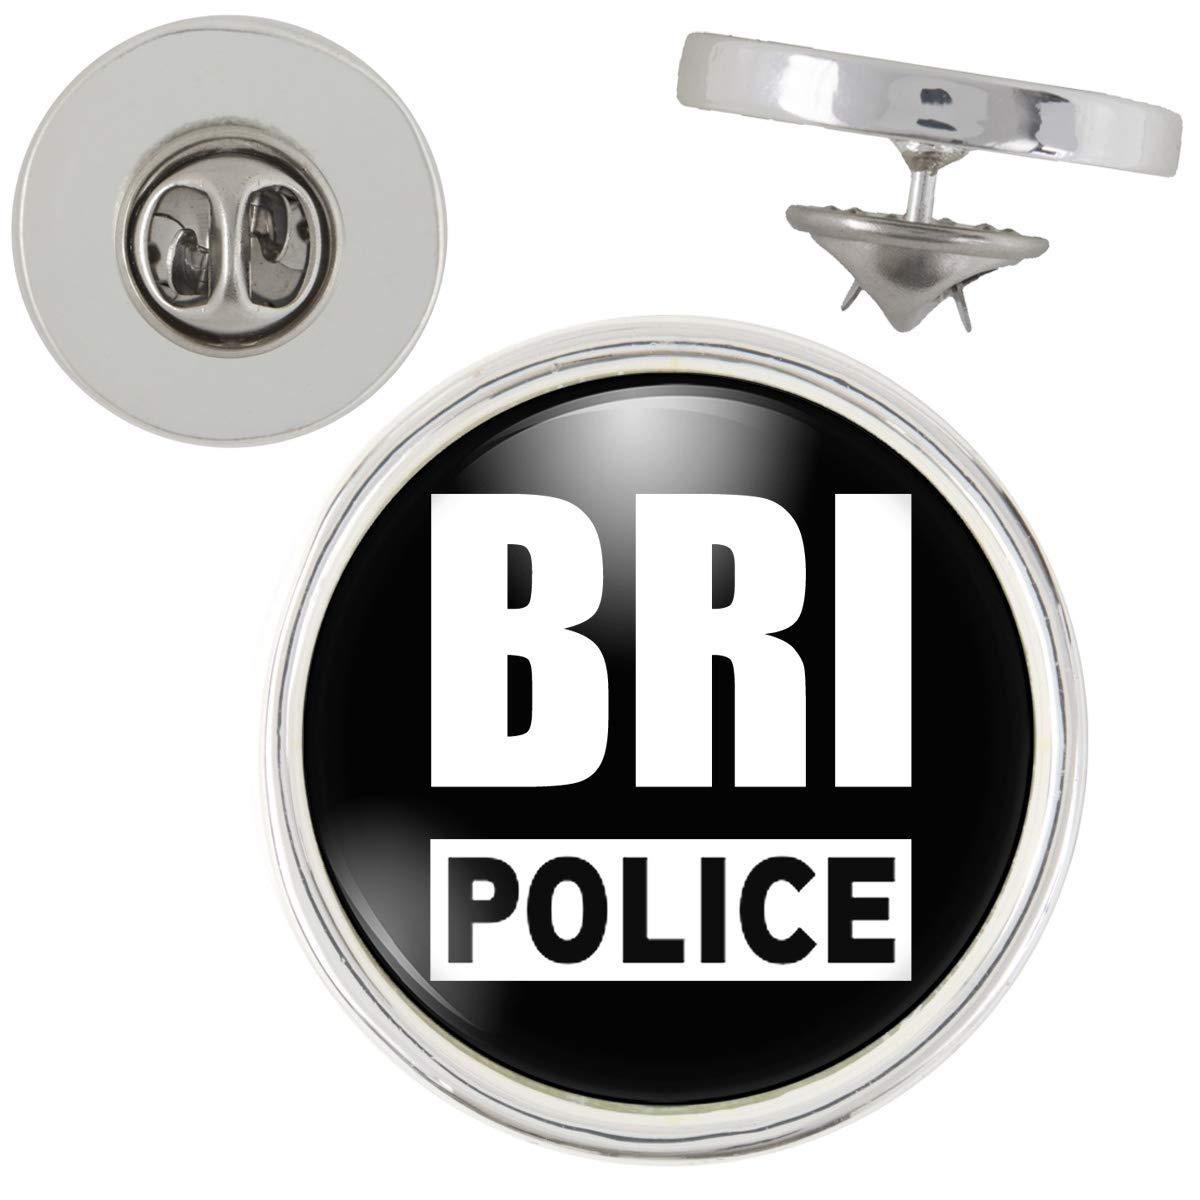 Pin's Police BRI Brigade Recherche Intervention 20mm Pins Bouton Epinglette Coloris Argent Générique GAMA_PINA-BRI1